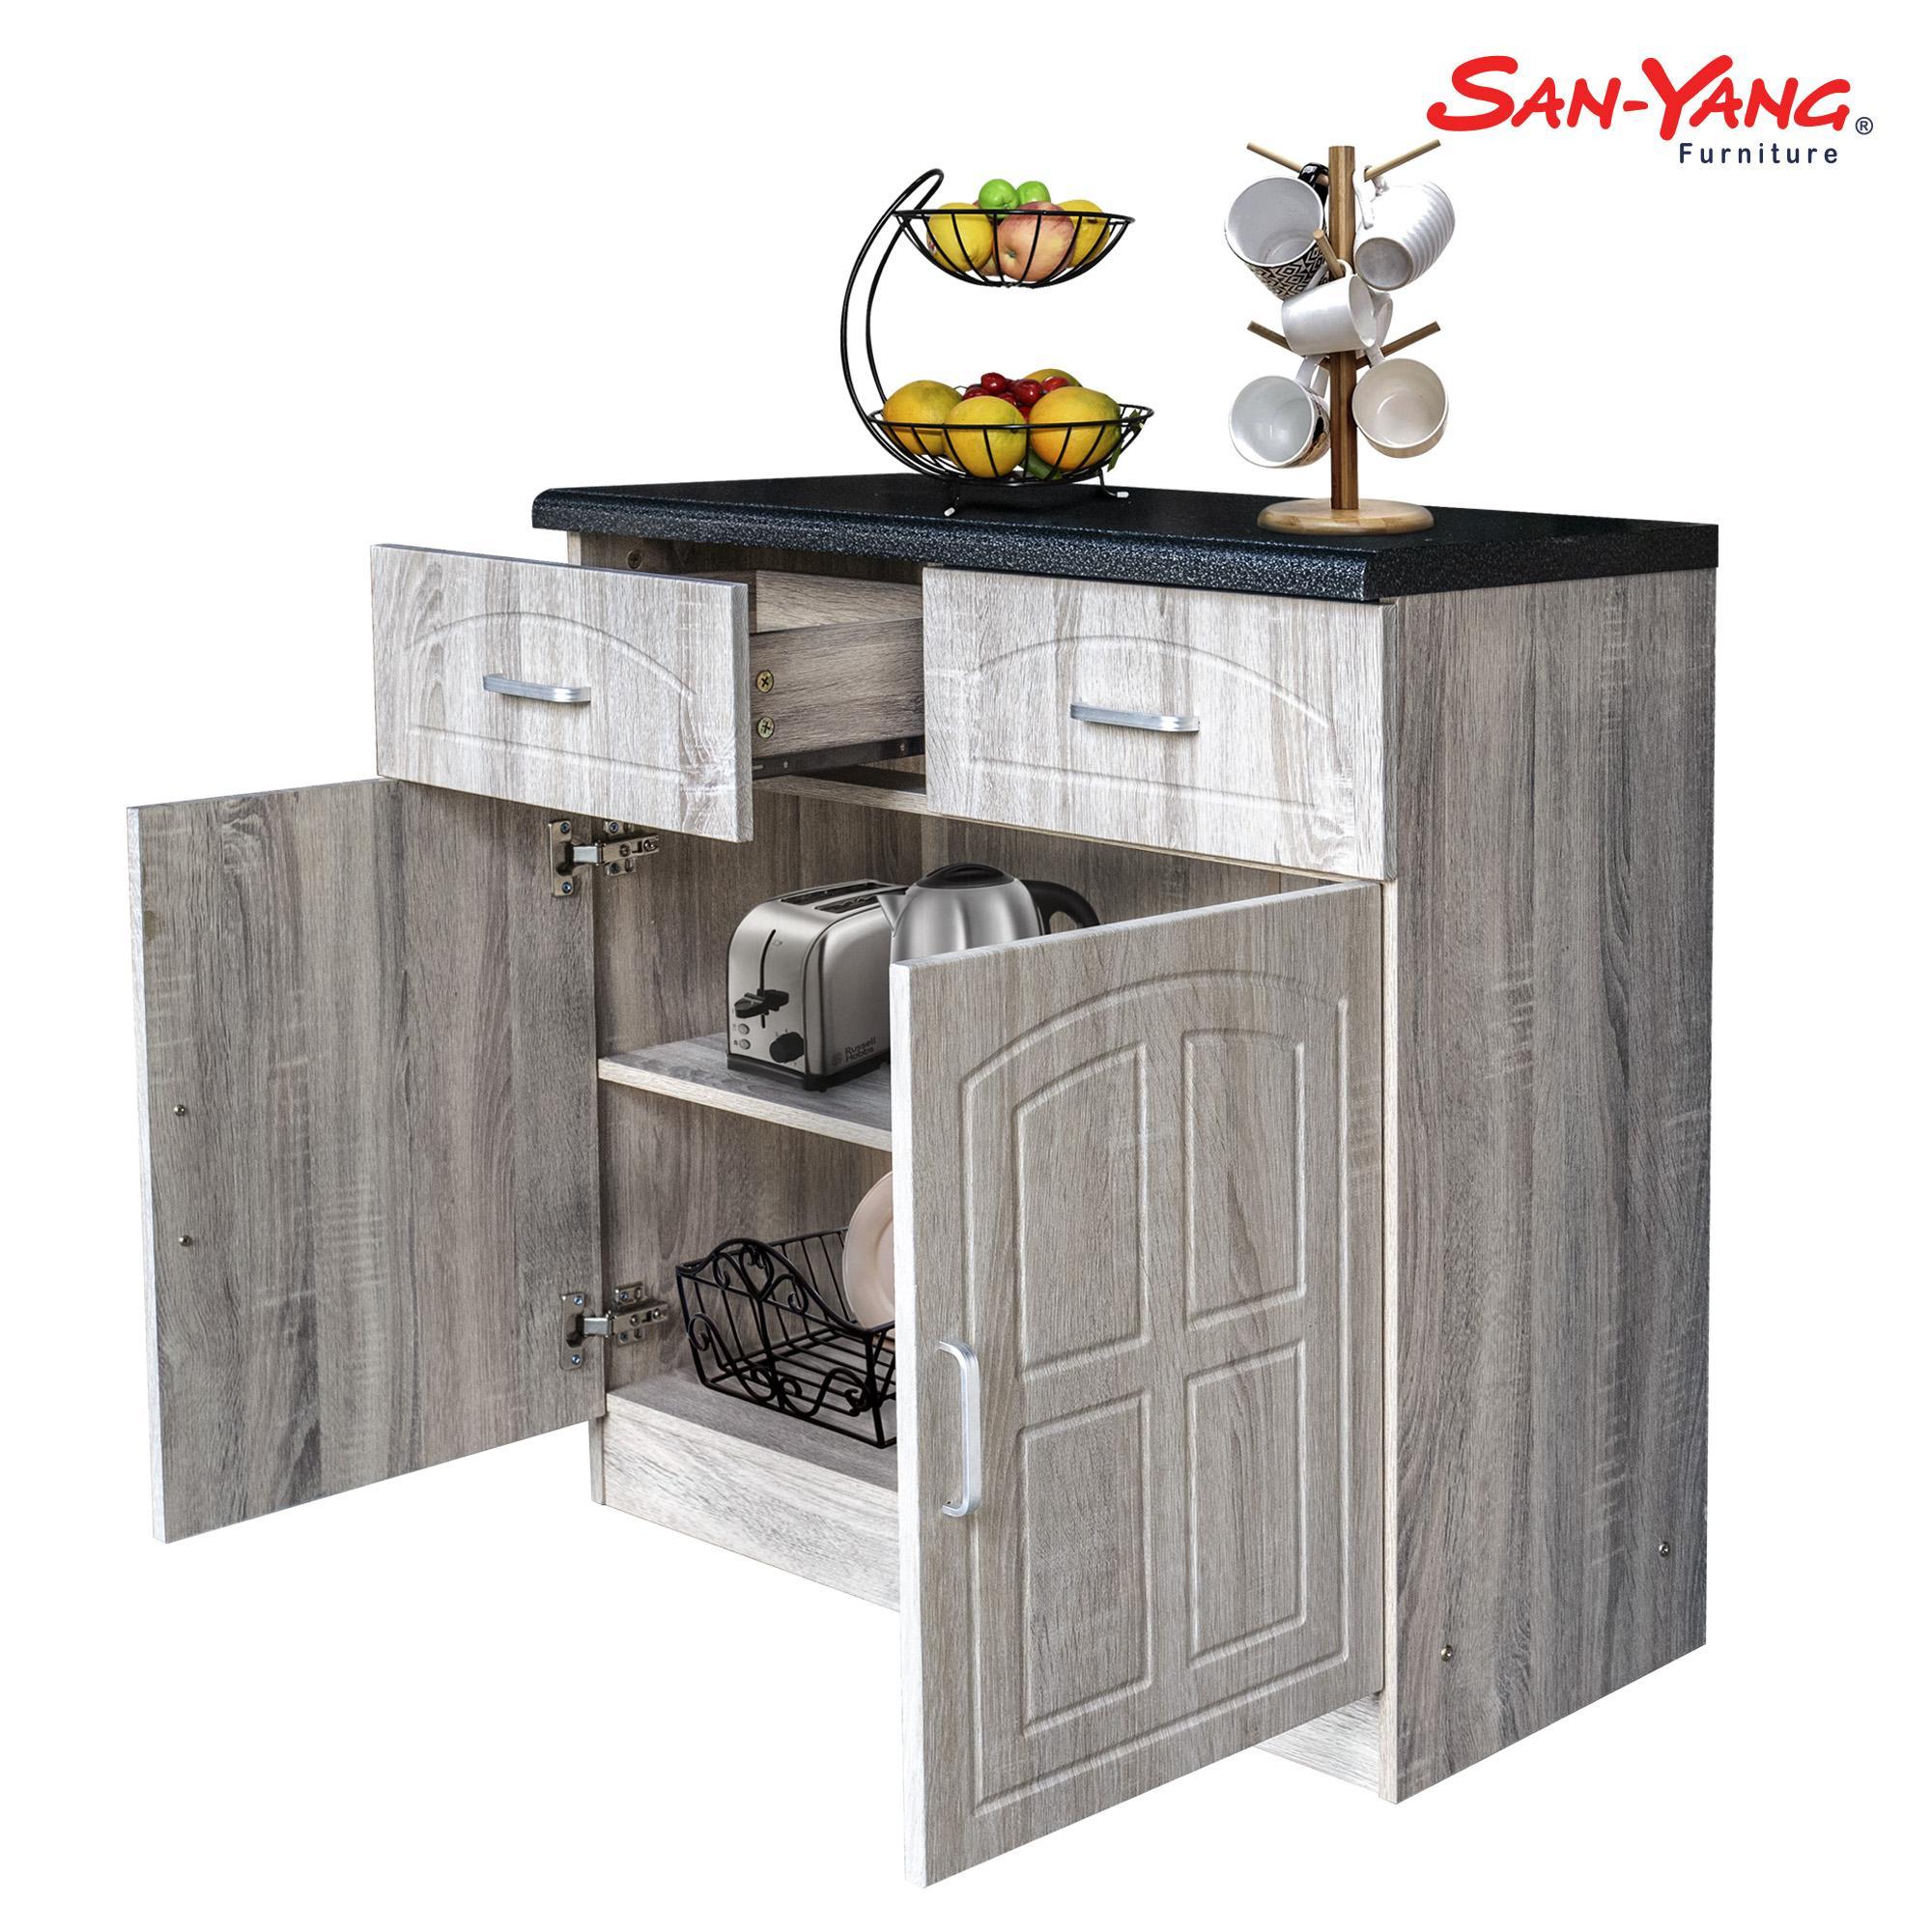 Buy Kitchen Furniture Online: Buy Latest Kitchen & Dining Furniture At Best Price Online